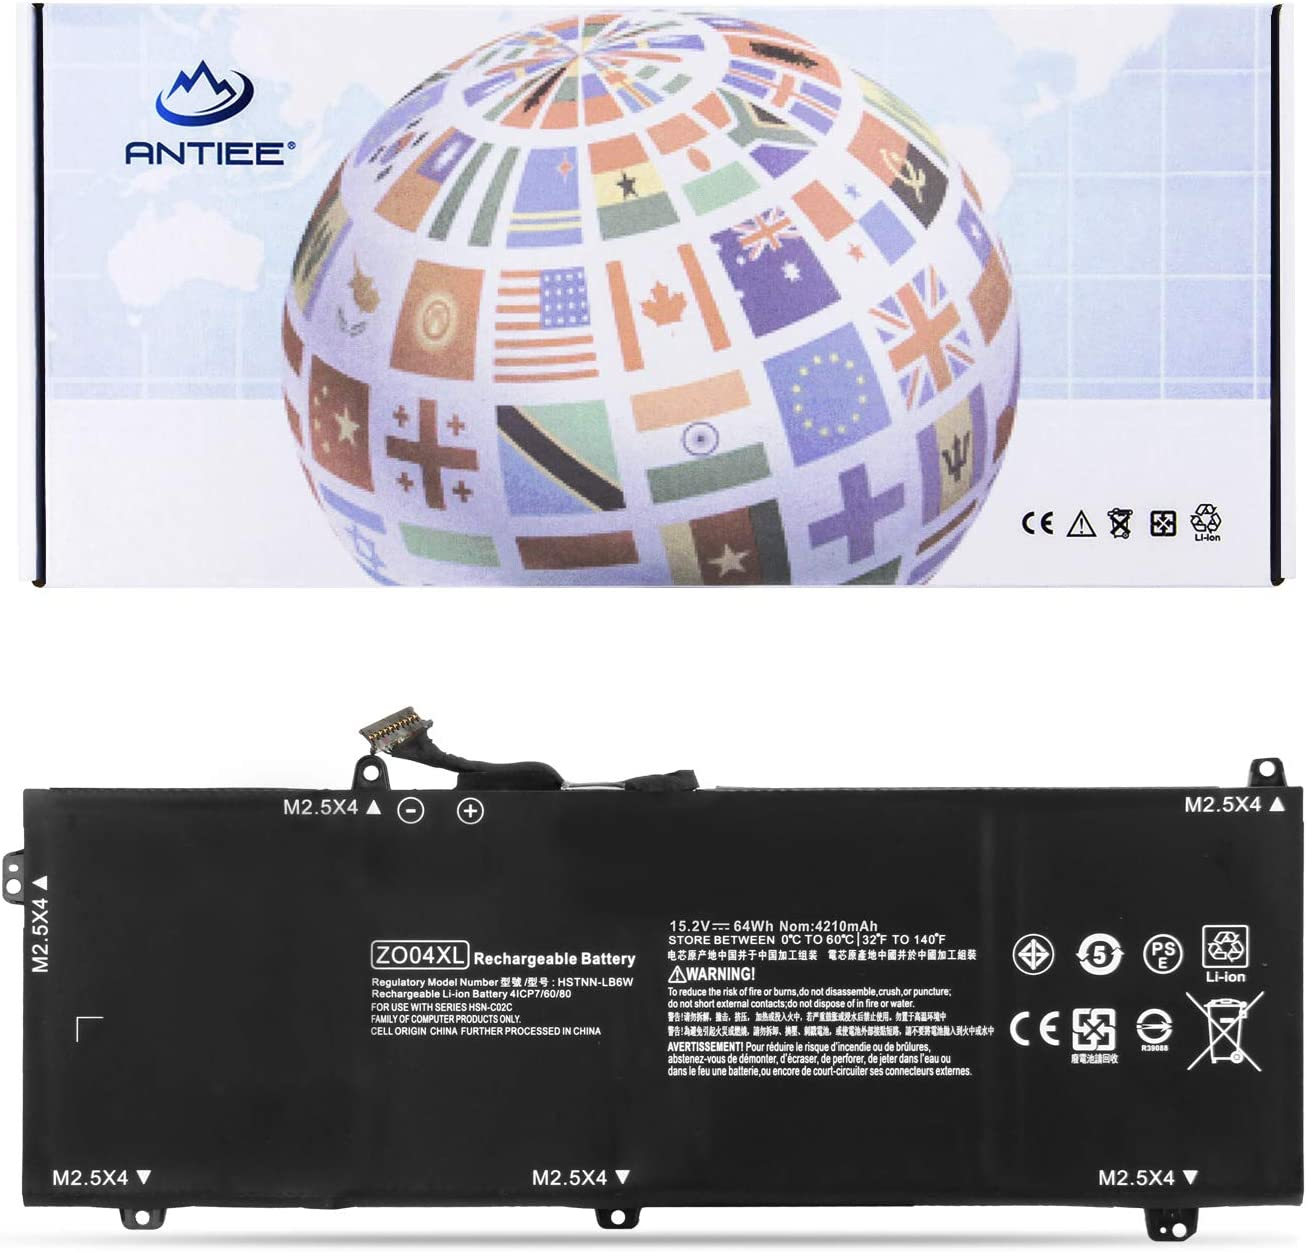 ANTIEE ZO04 ZO04XL Laptop Battery for HP ZBook Studio G3 Mobile Workstation Series 808396-421 808450-001 HSTNN-CS8C HSTNN-C88C HSTNN-LB6W ENR606080A2-CZO04 15.2V 64Wh